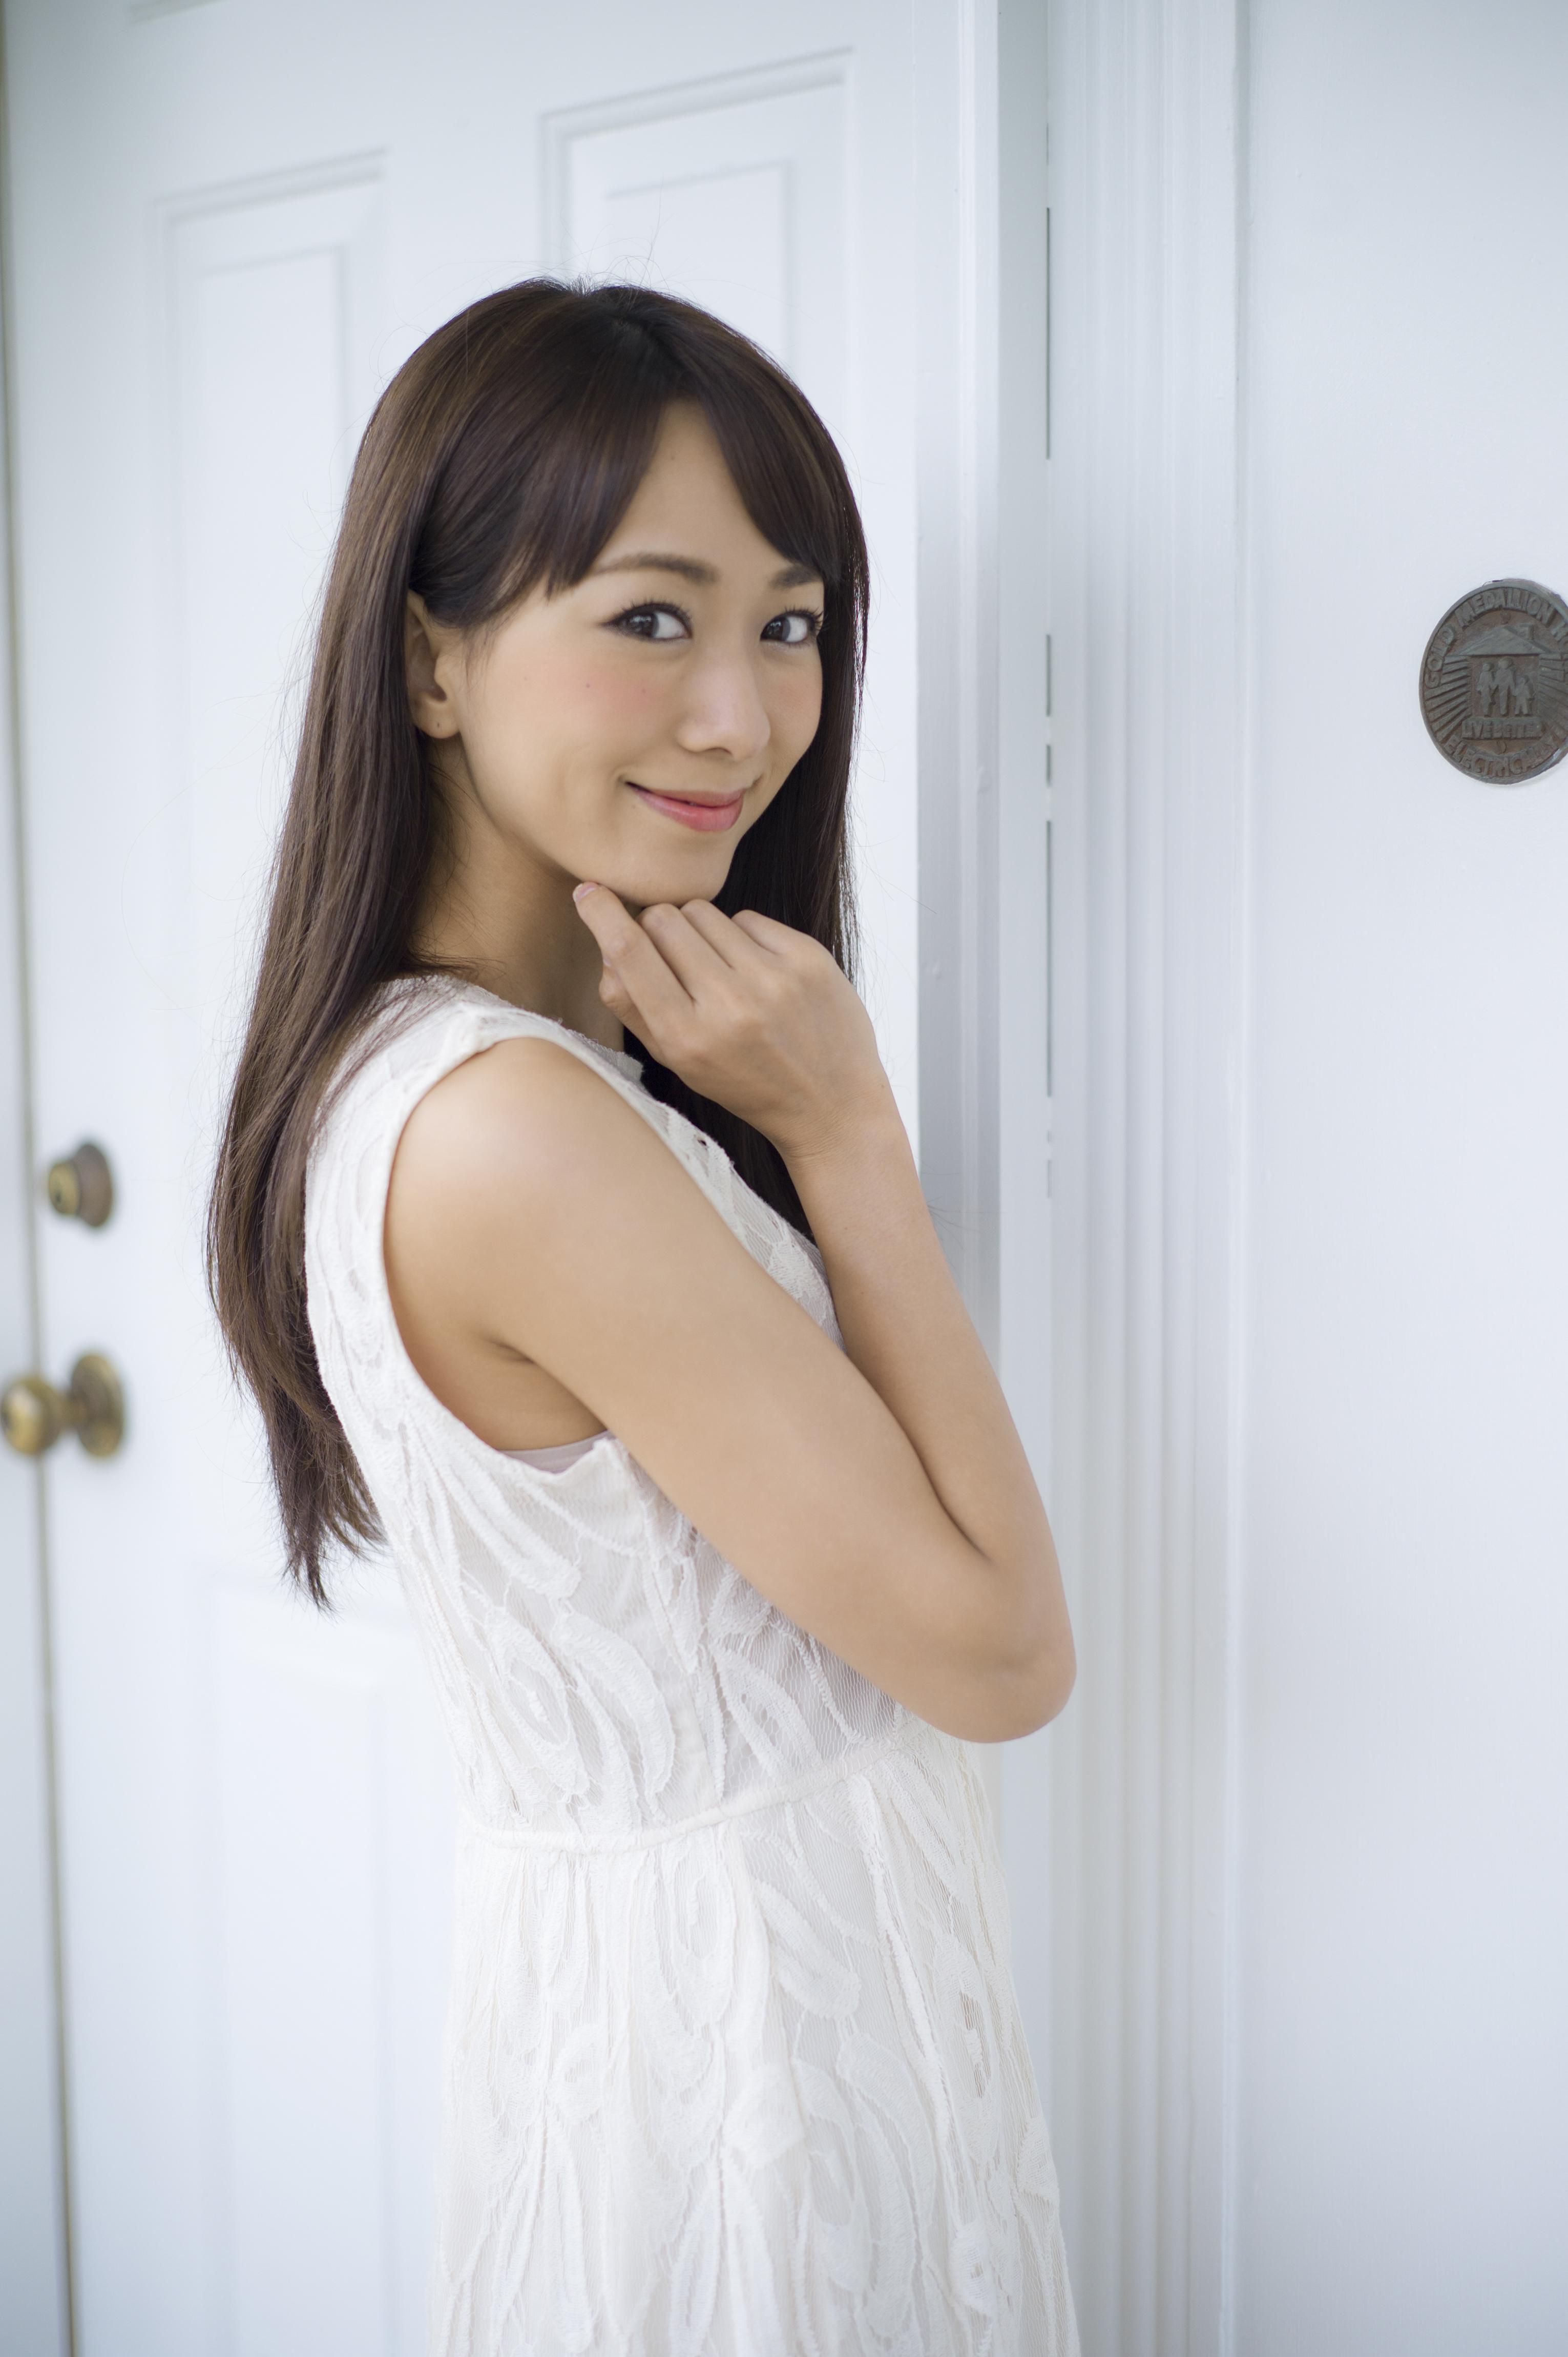 Yuko Shimizu Actress Wikipedia